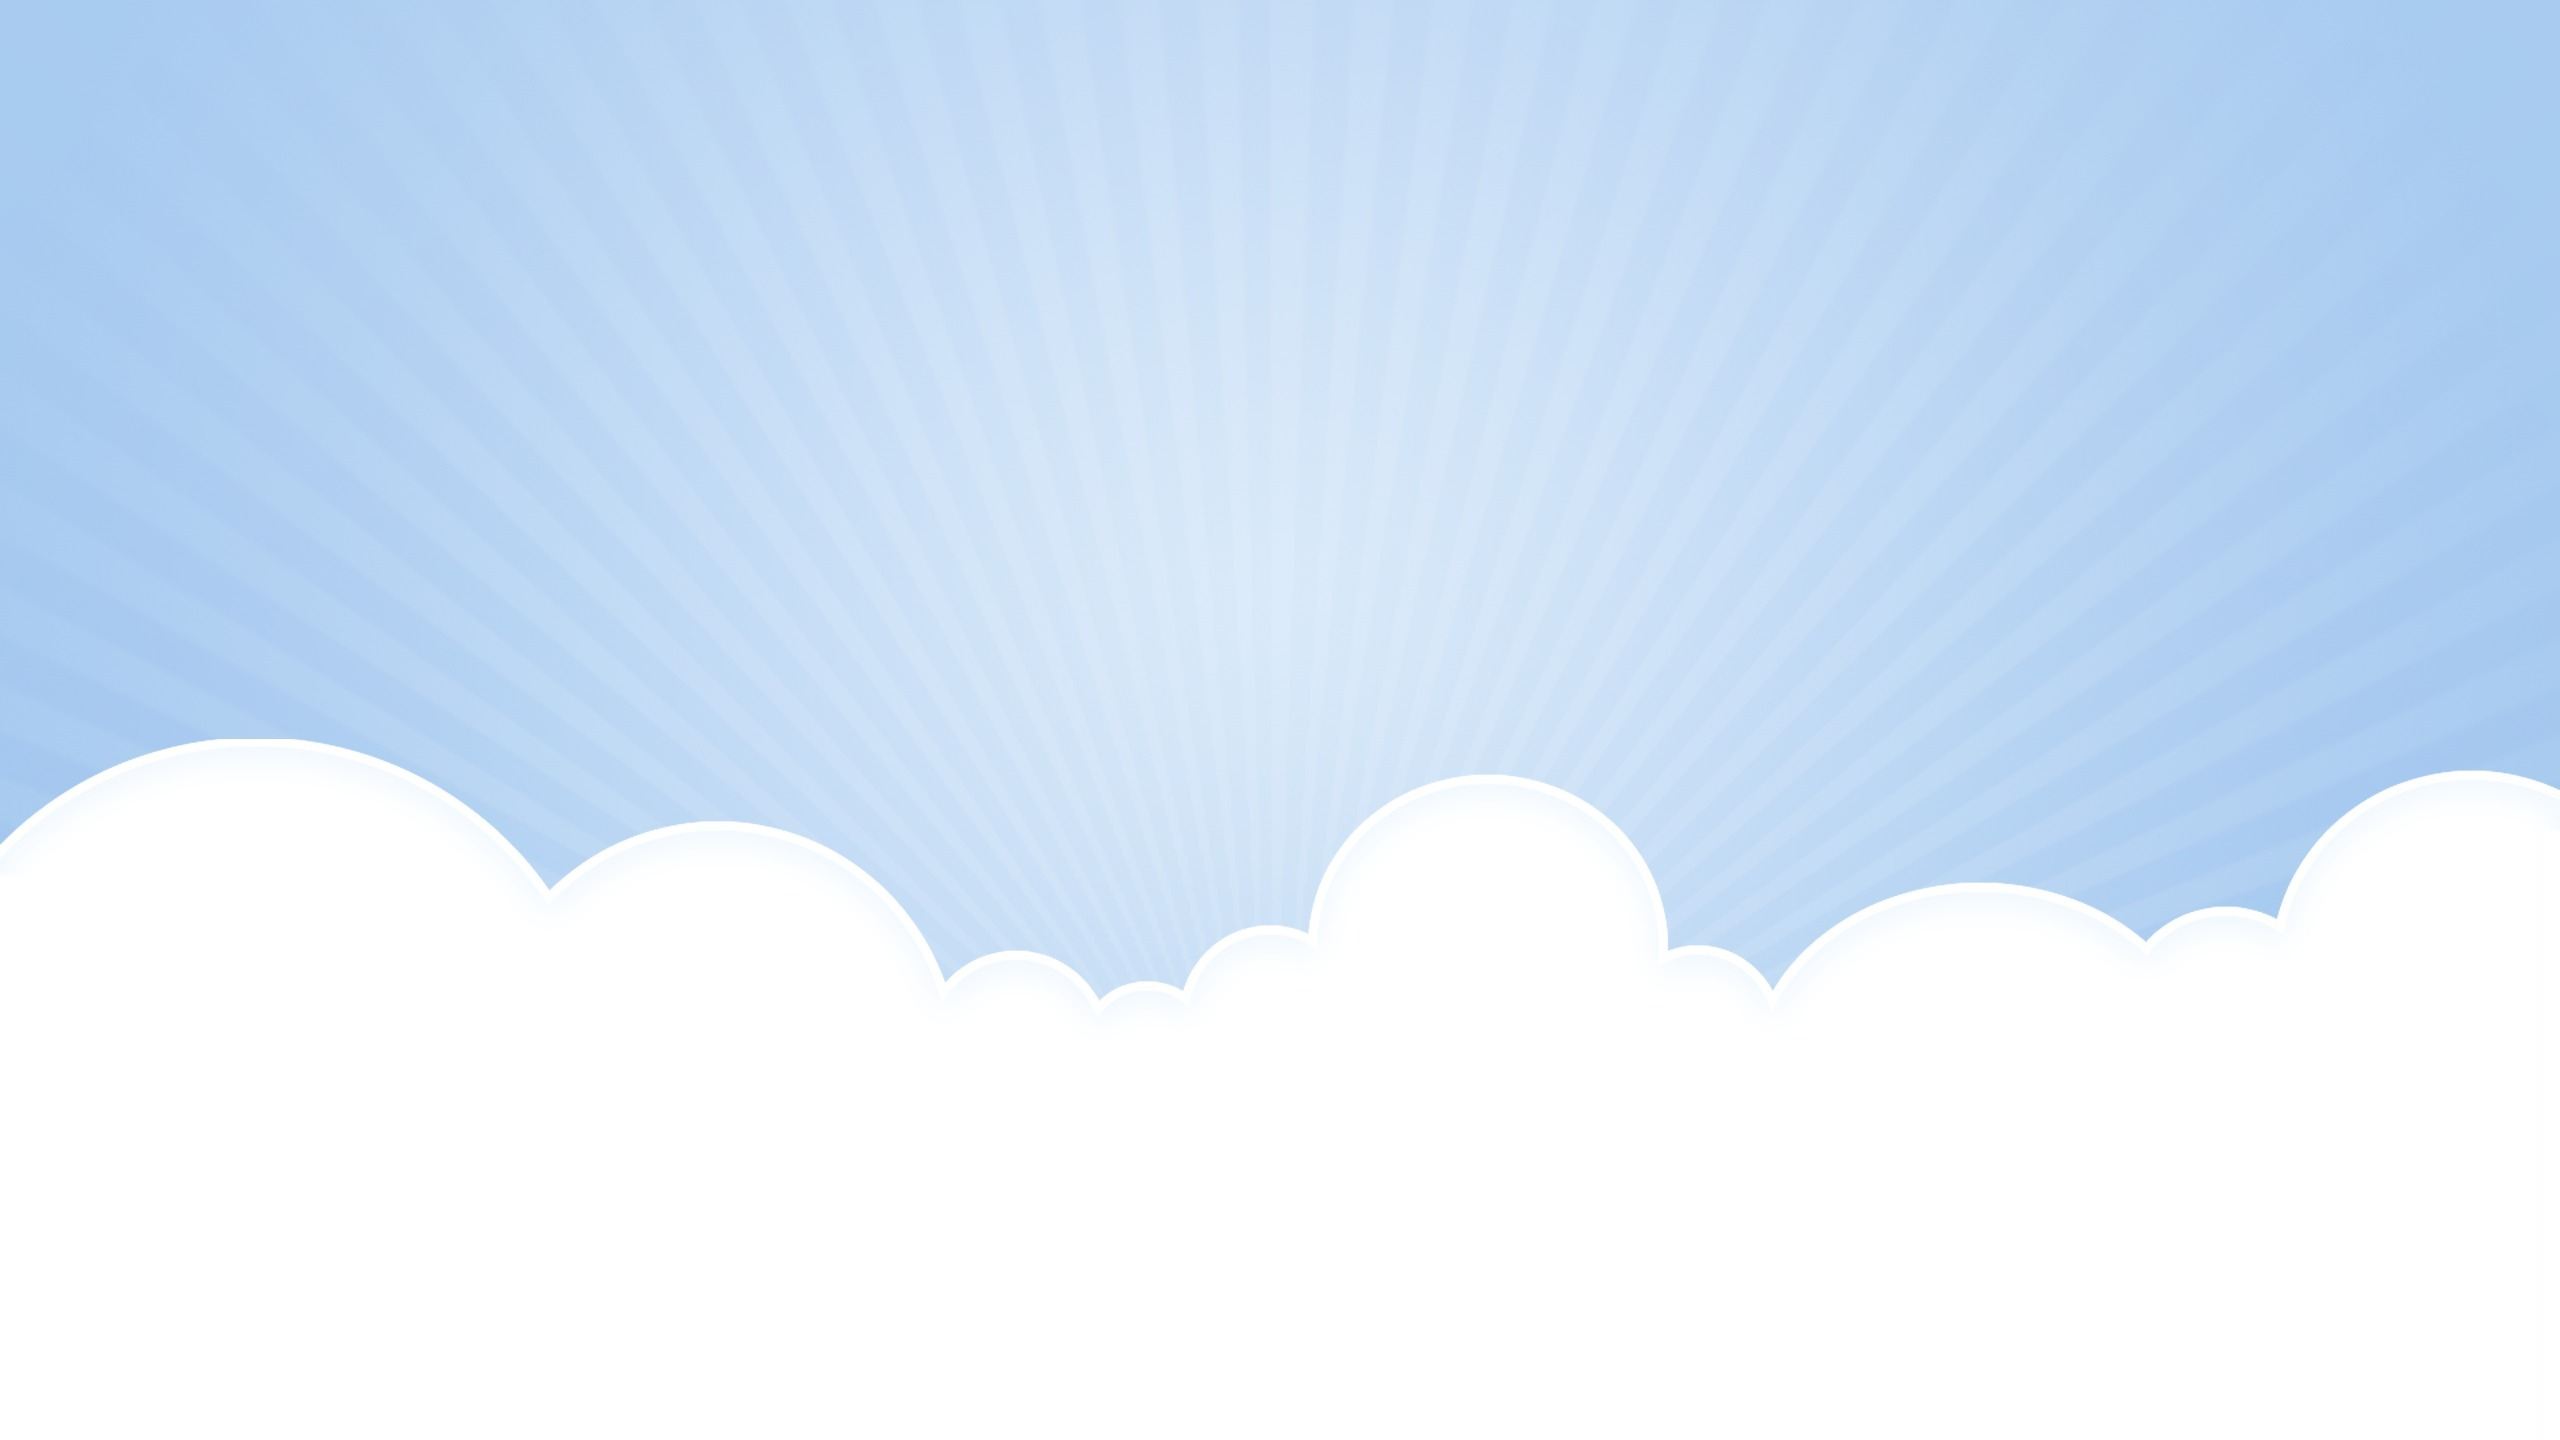 фон для сайта небо: